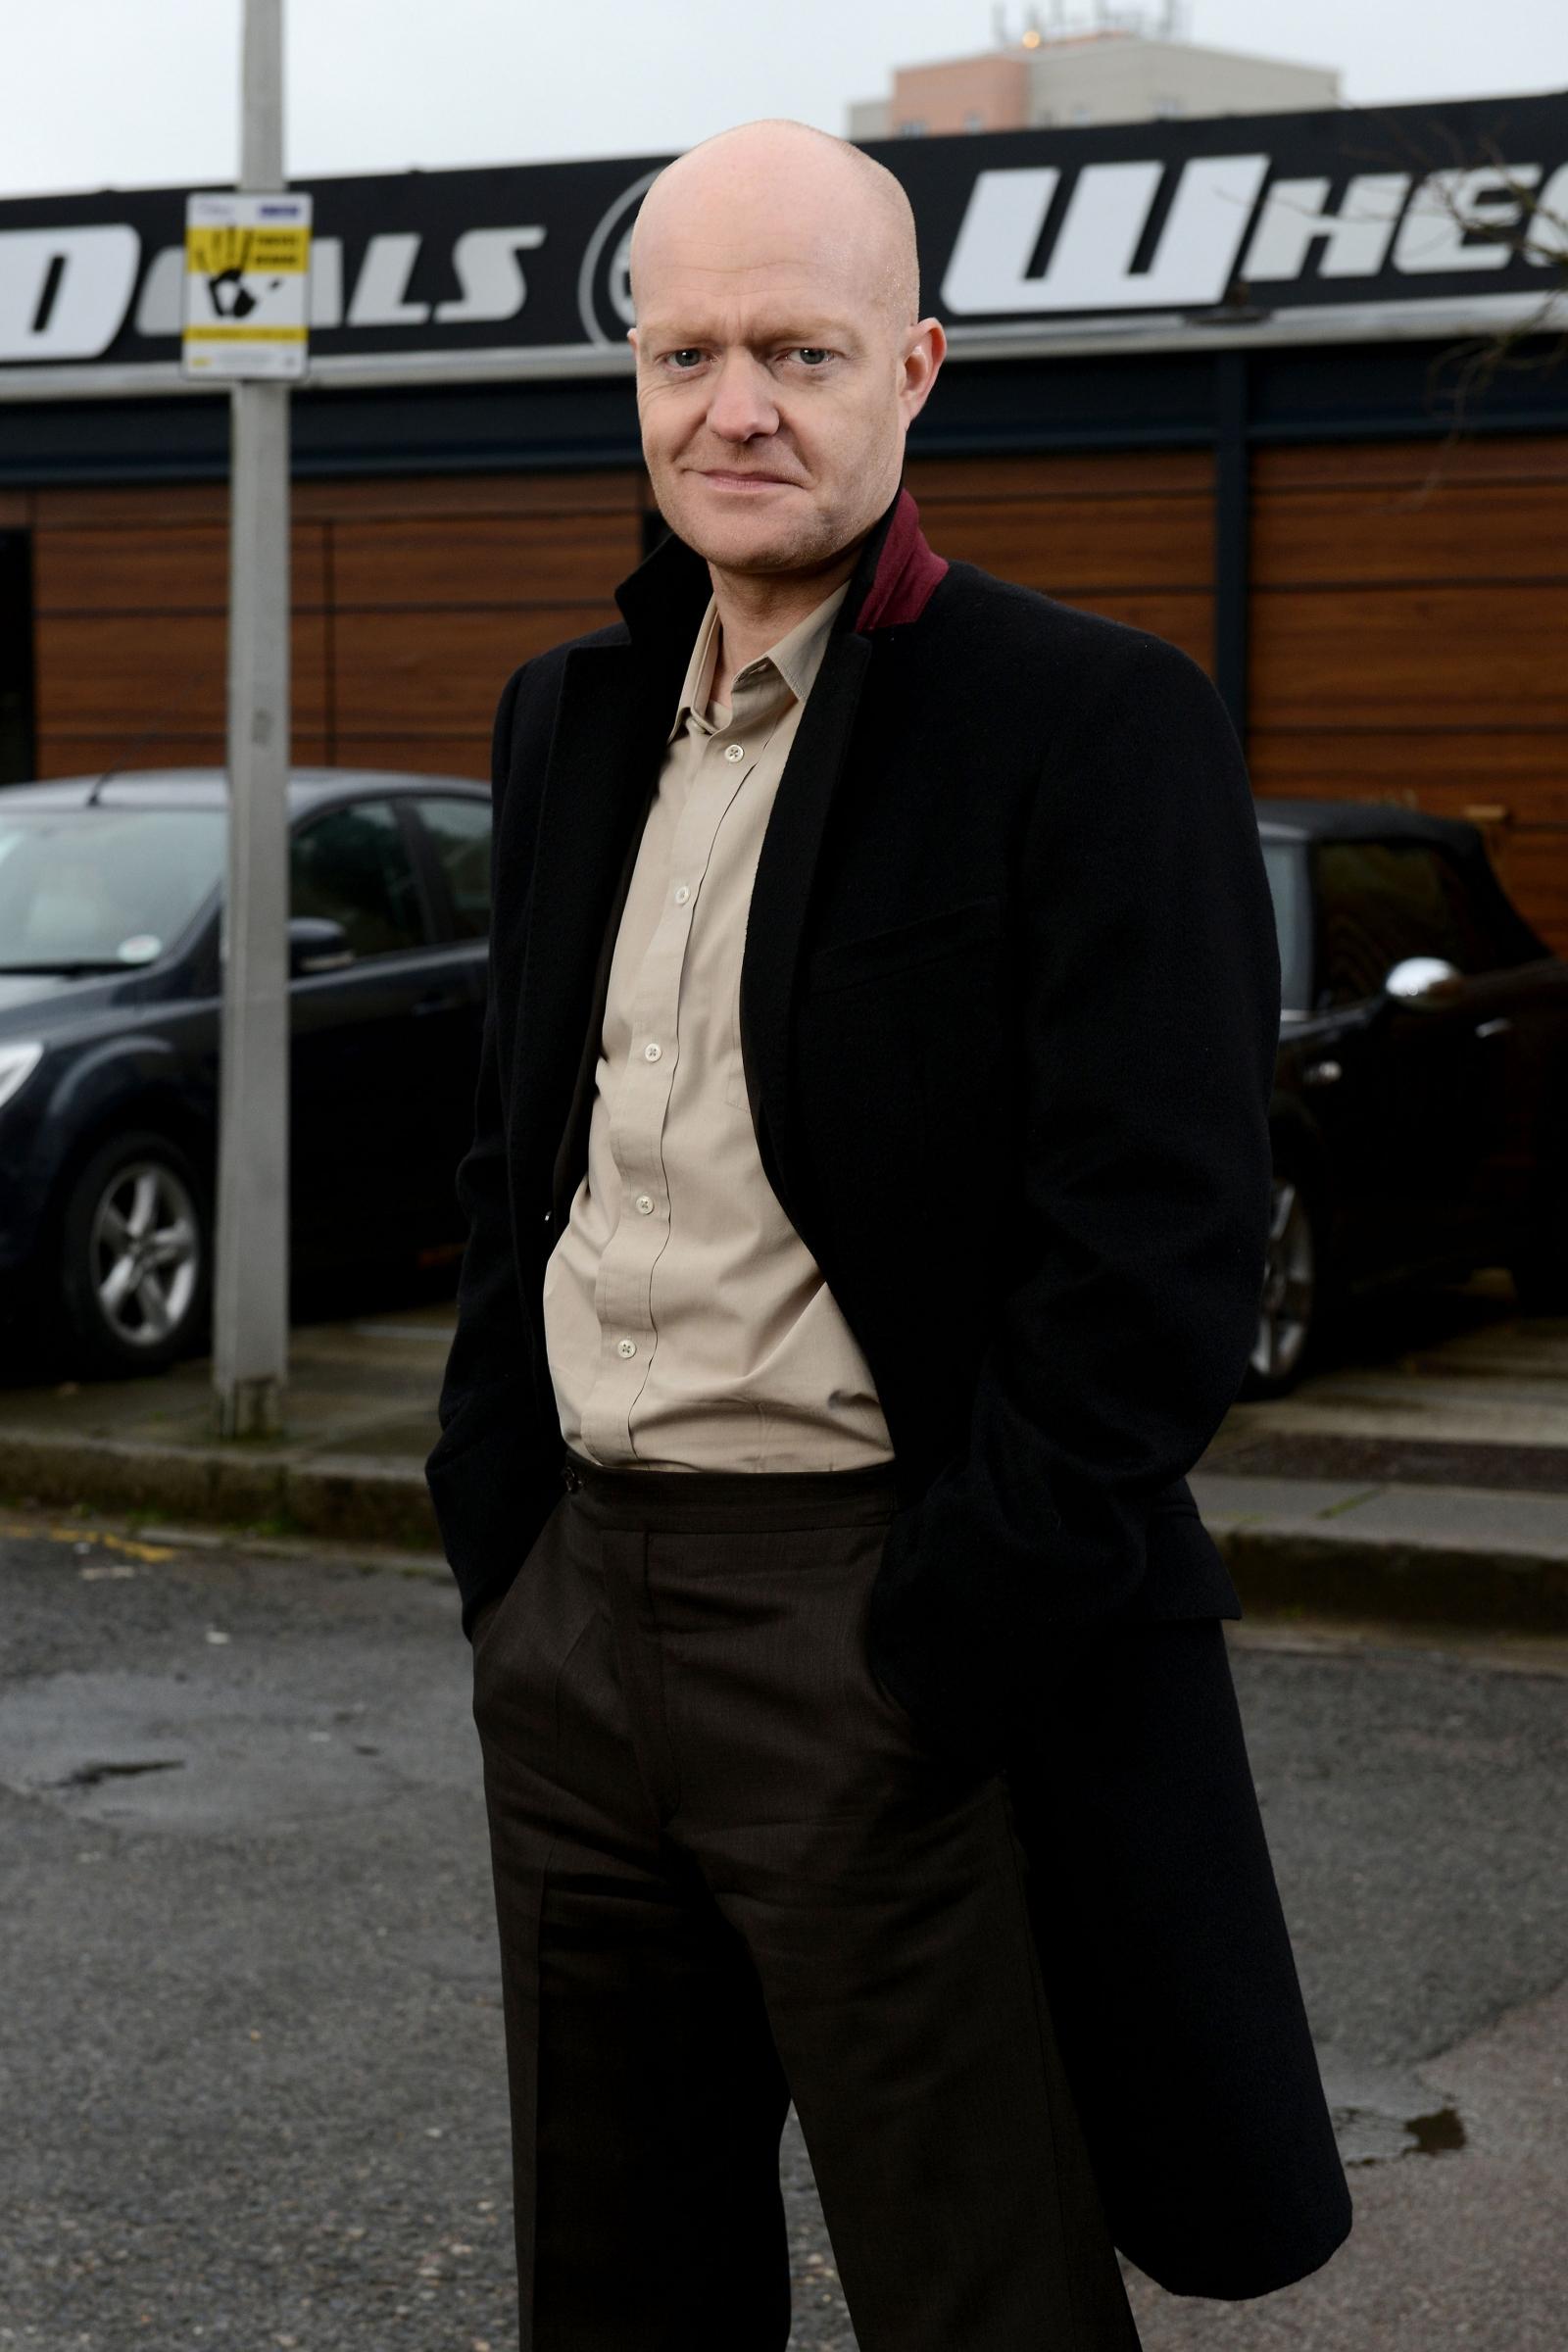 EastEnders' Max Branning played by Jake Wood